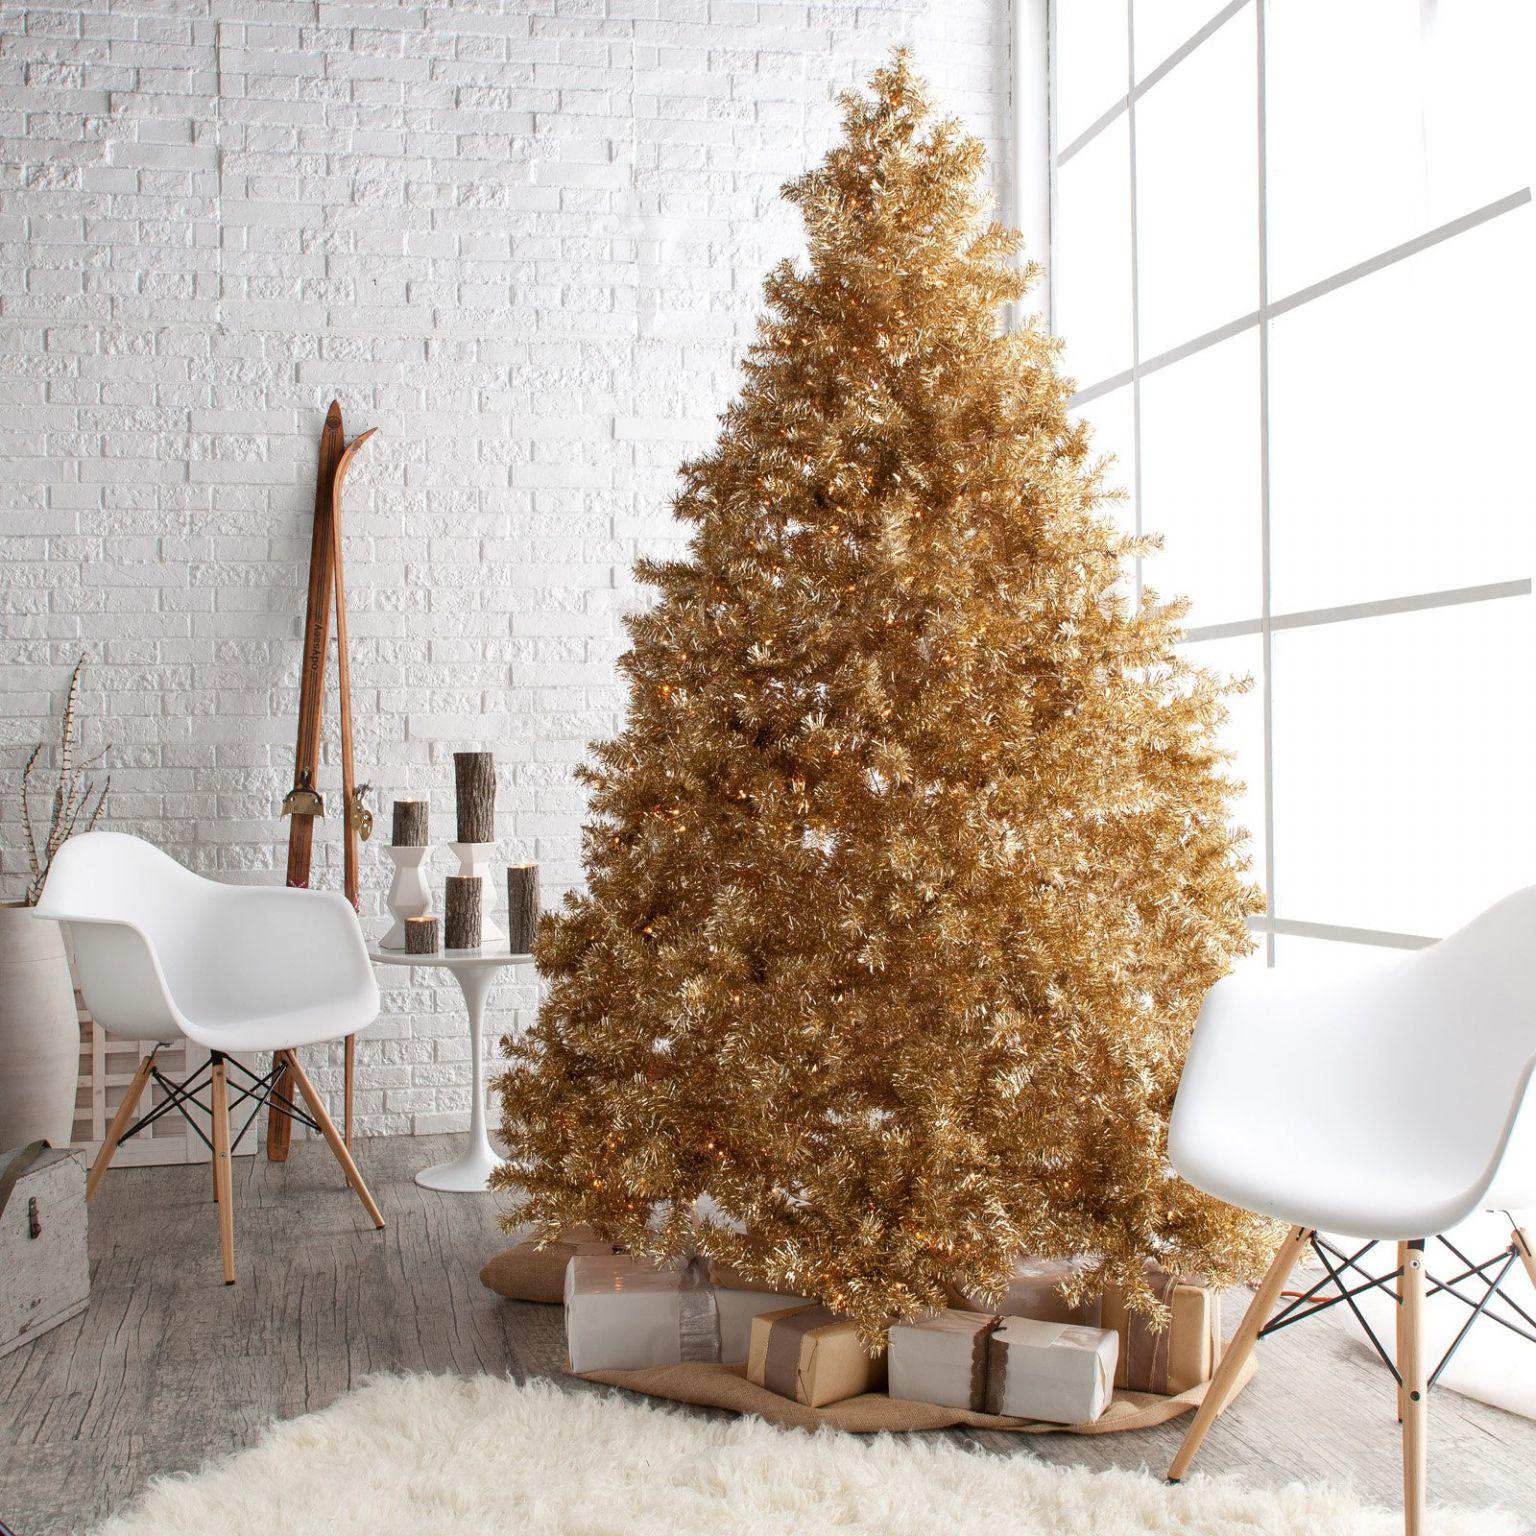 Golden Christmas Tree Decoration Thewowdecor